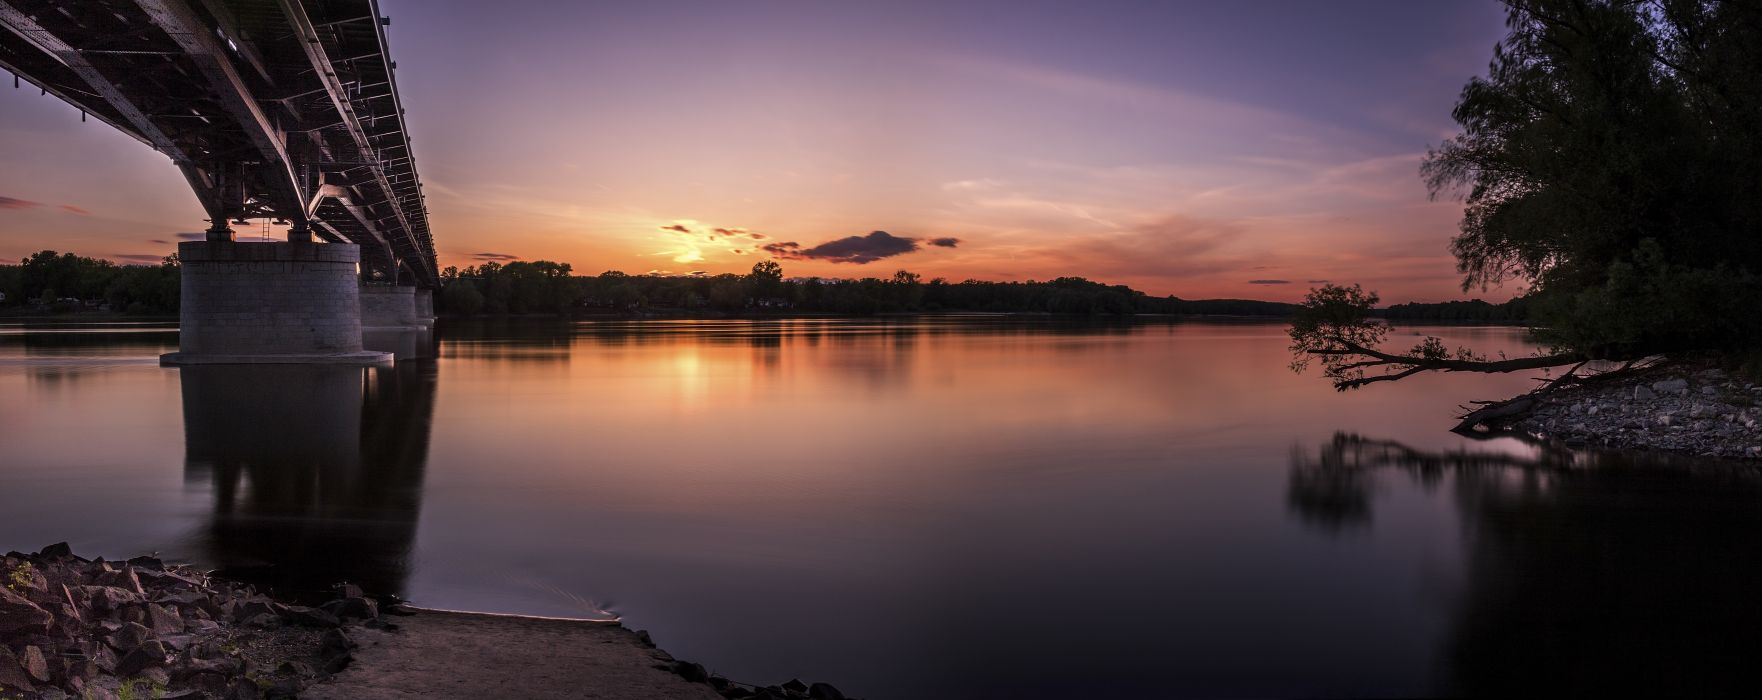 backlit bridge dawn dusk evening lake landscape light outdoors reflection river silhouette sun sunset travel tree water wallpaper